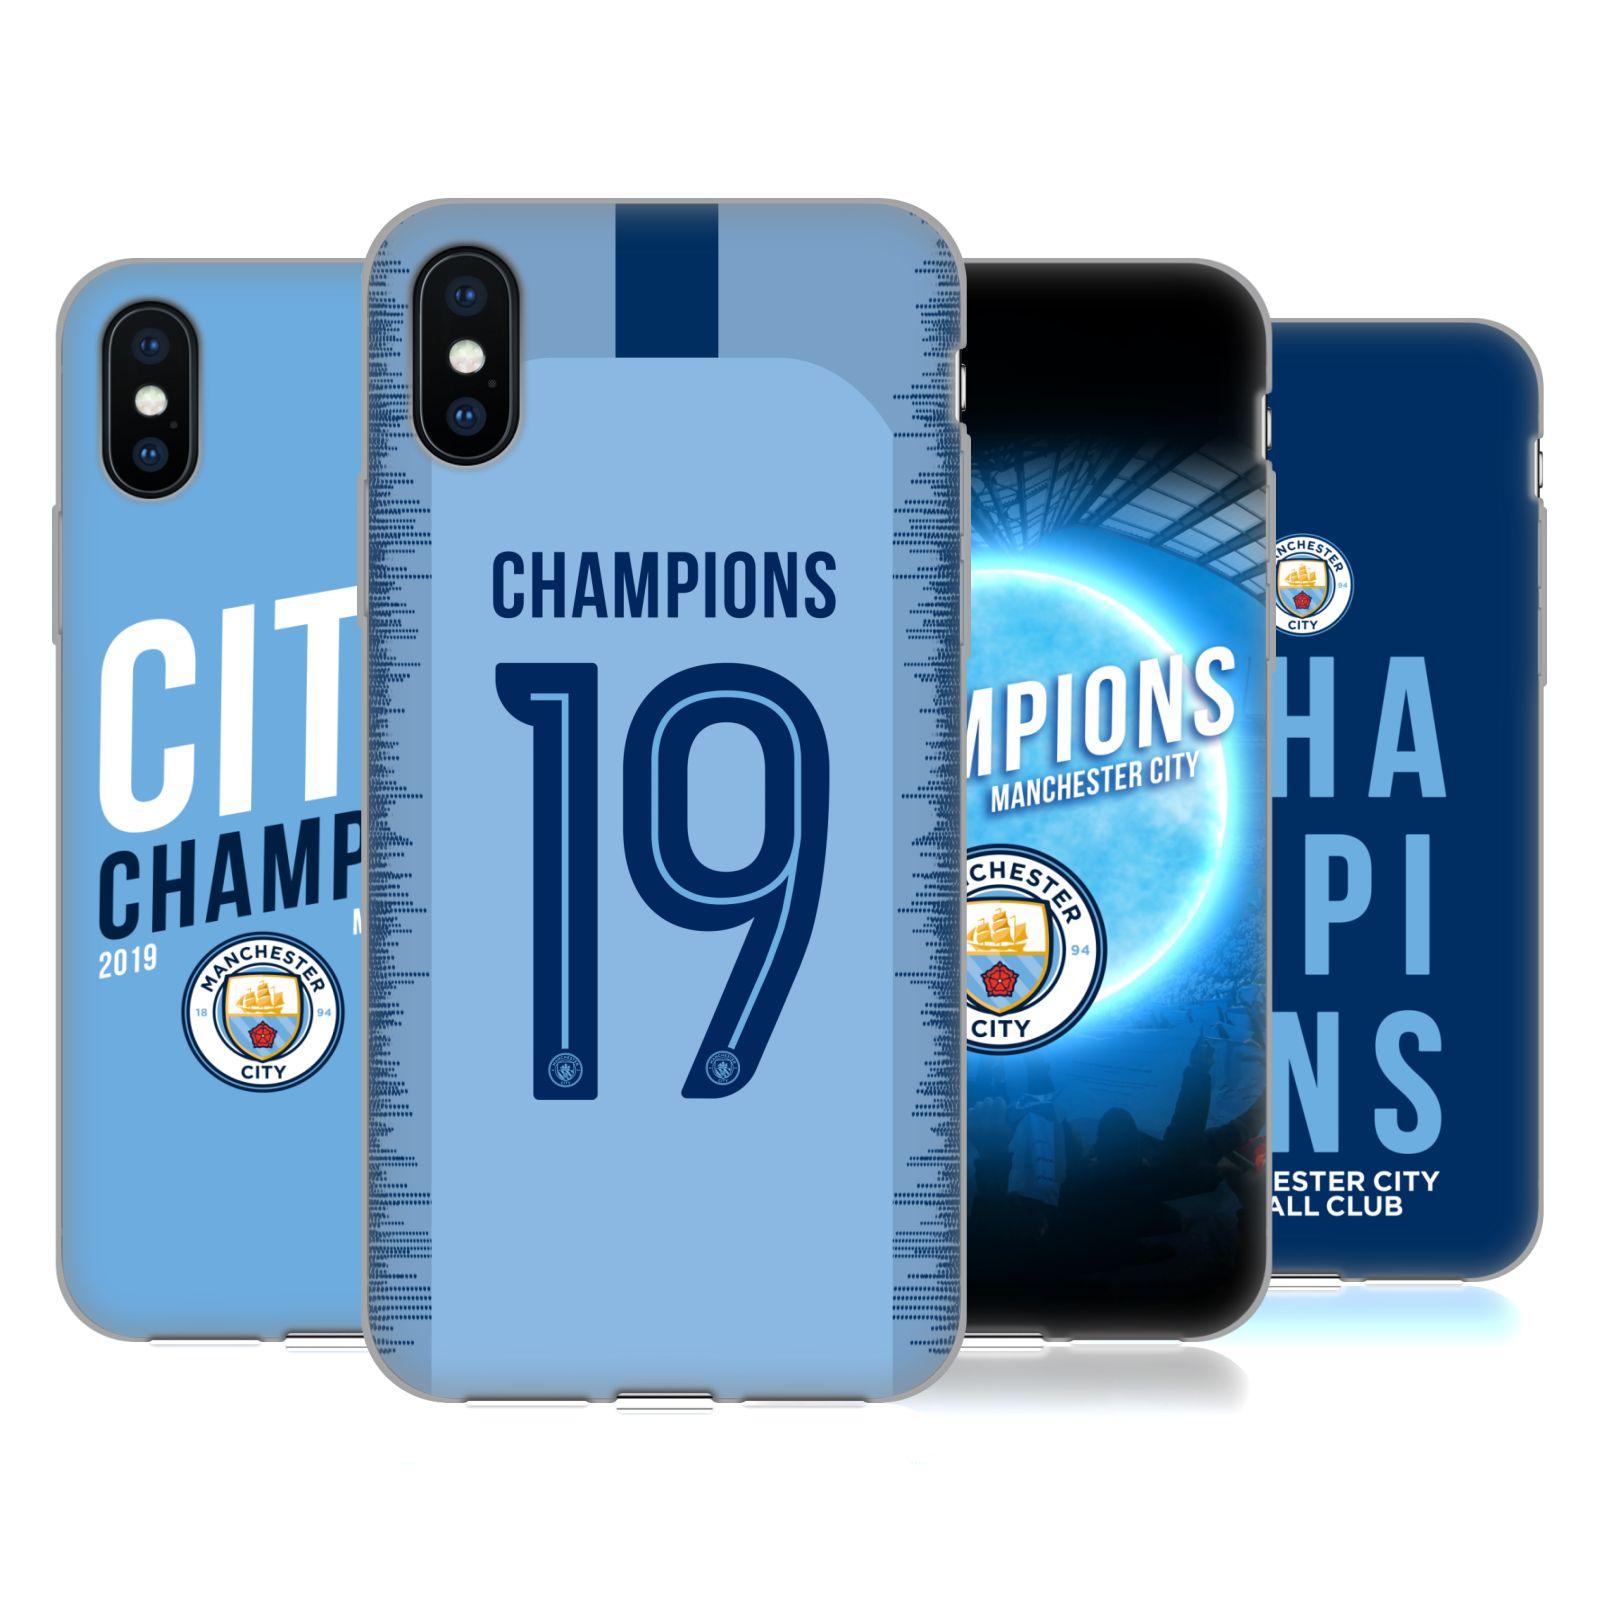 Manchester City Man City FC <!--translate-lineup-->2019 Champions<!--translate-lineup-->